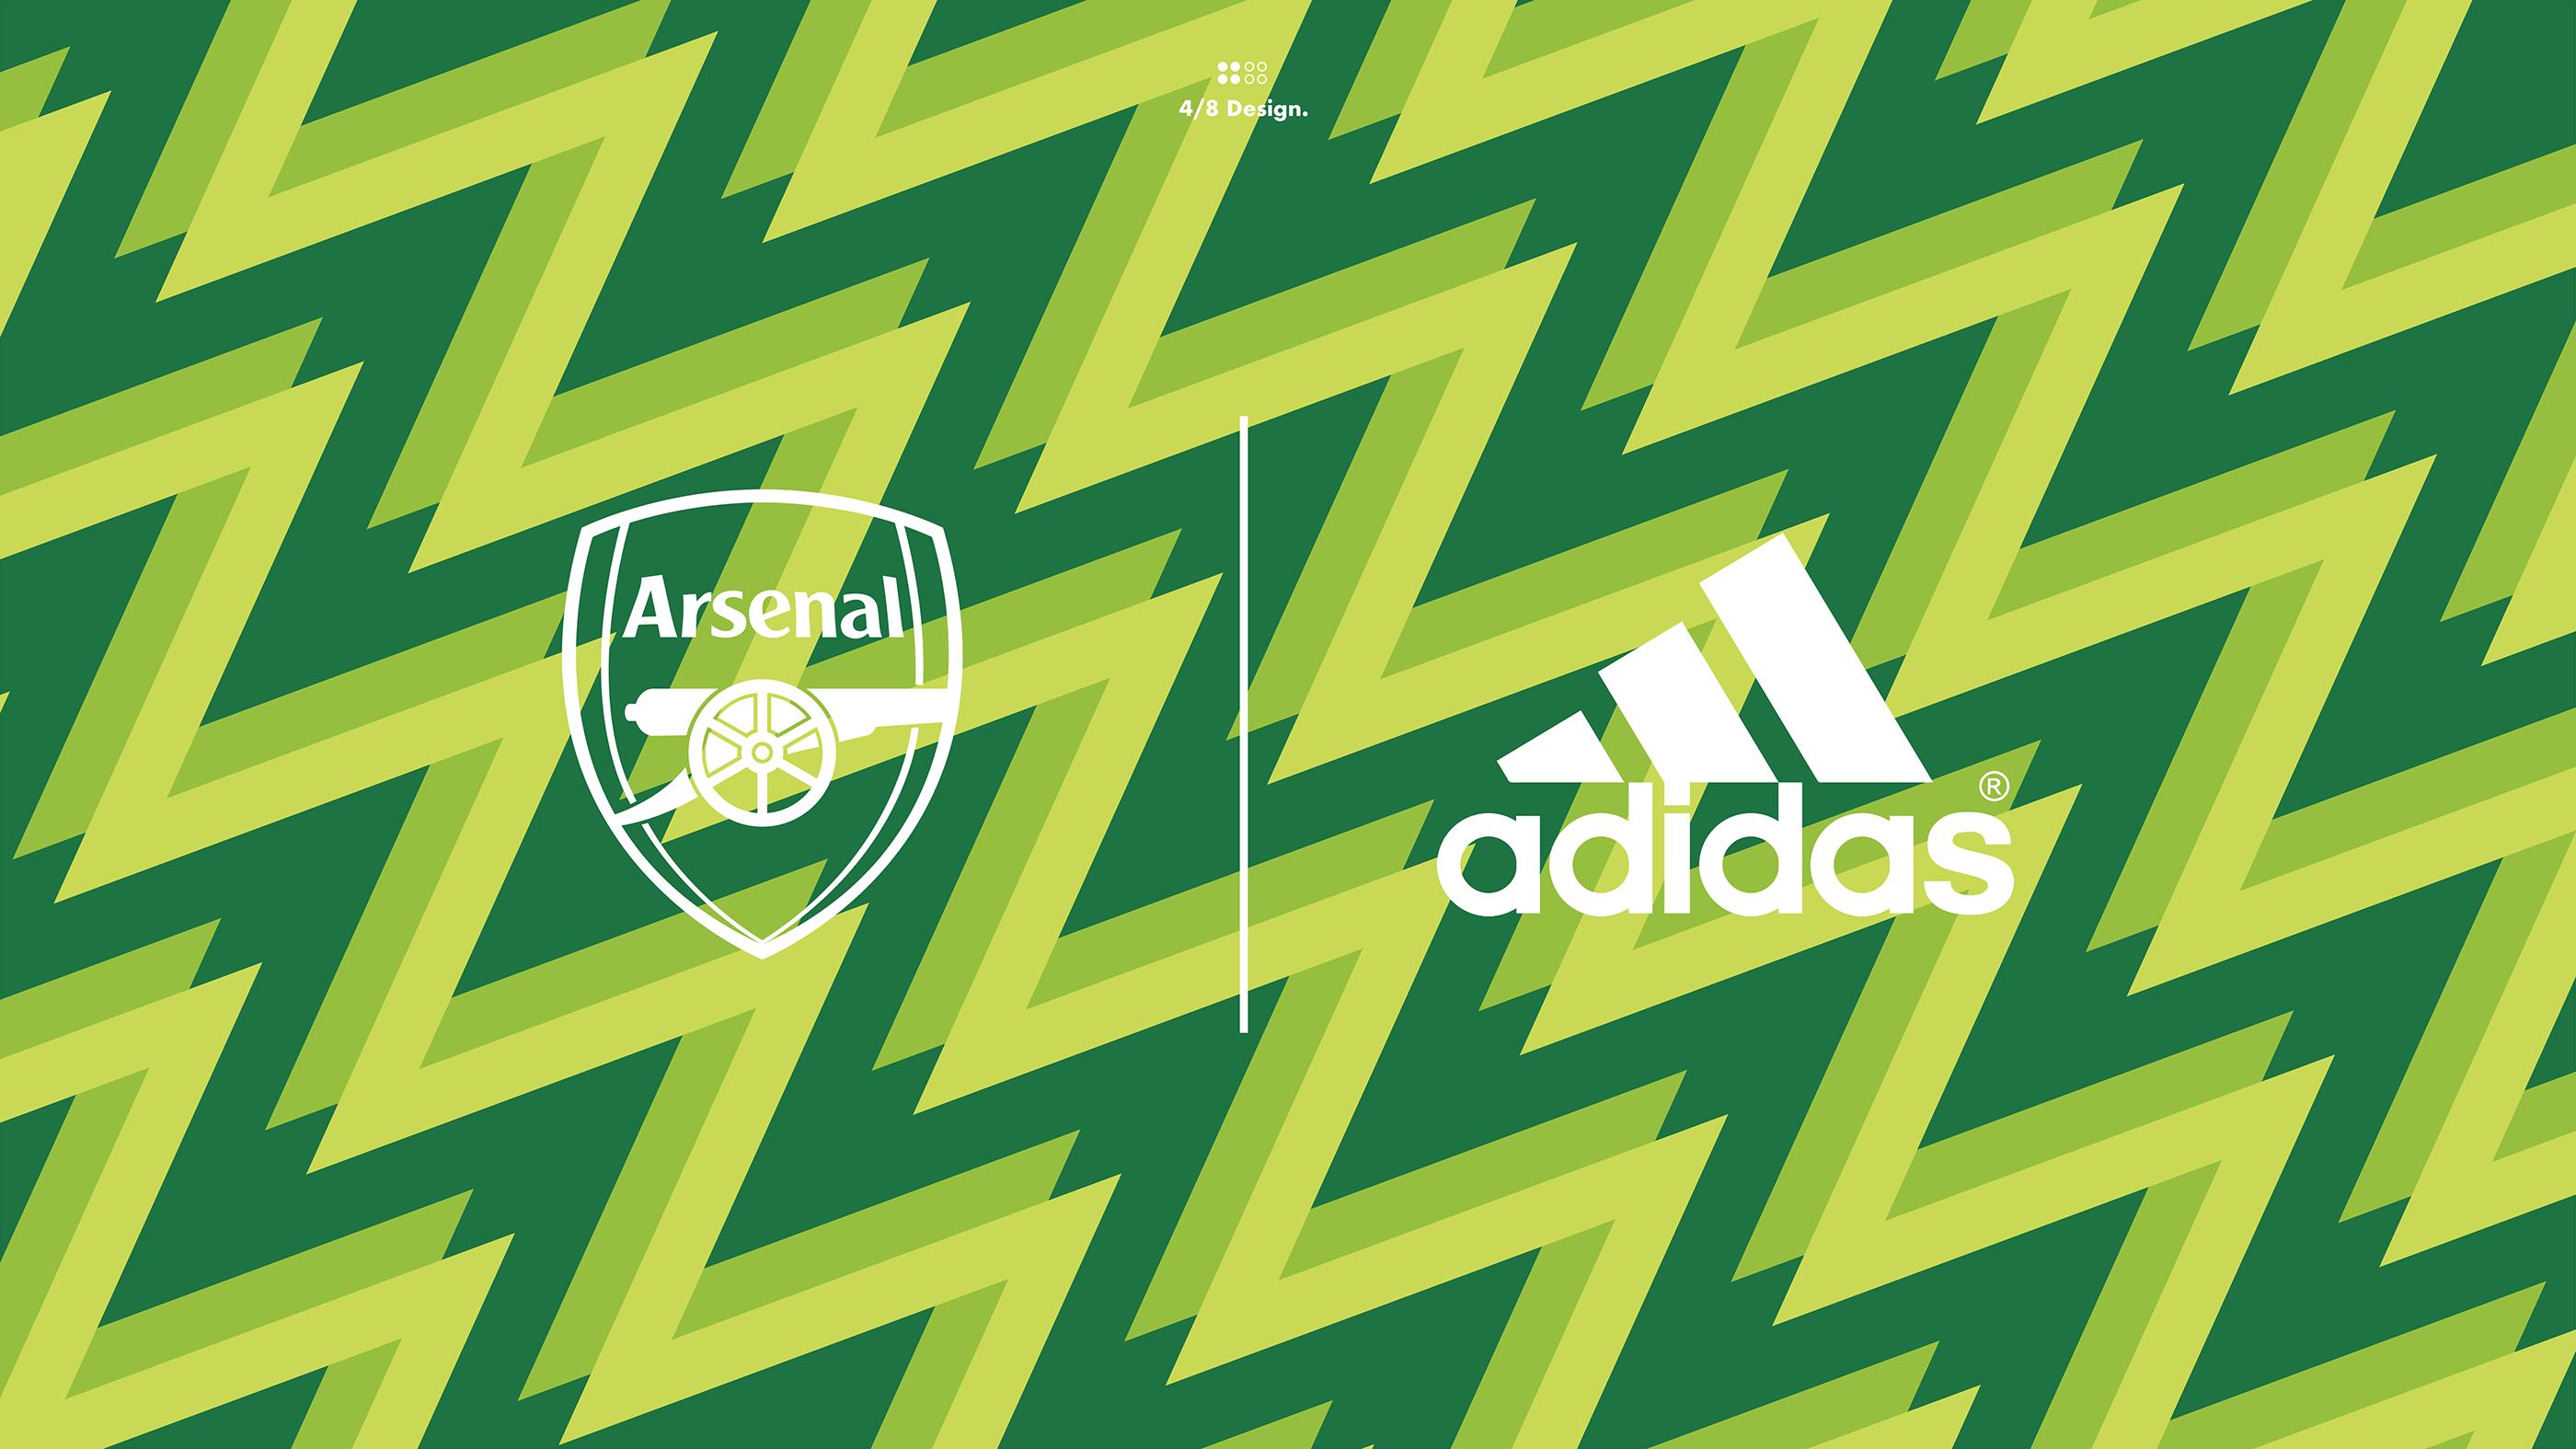 adidas x arsenal wallpaper on behance